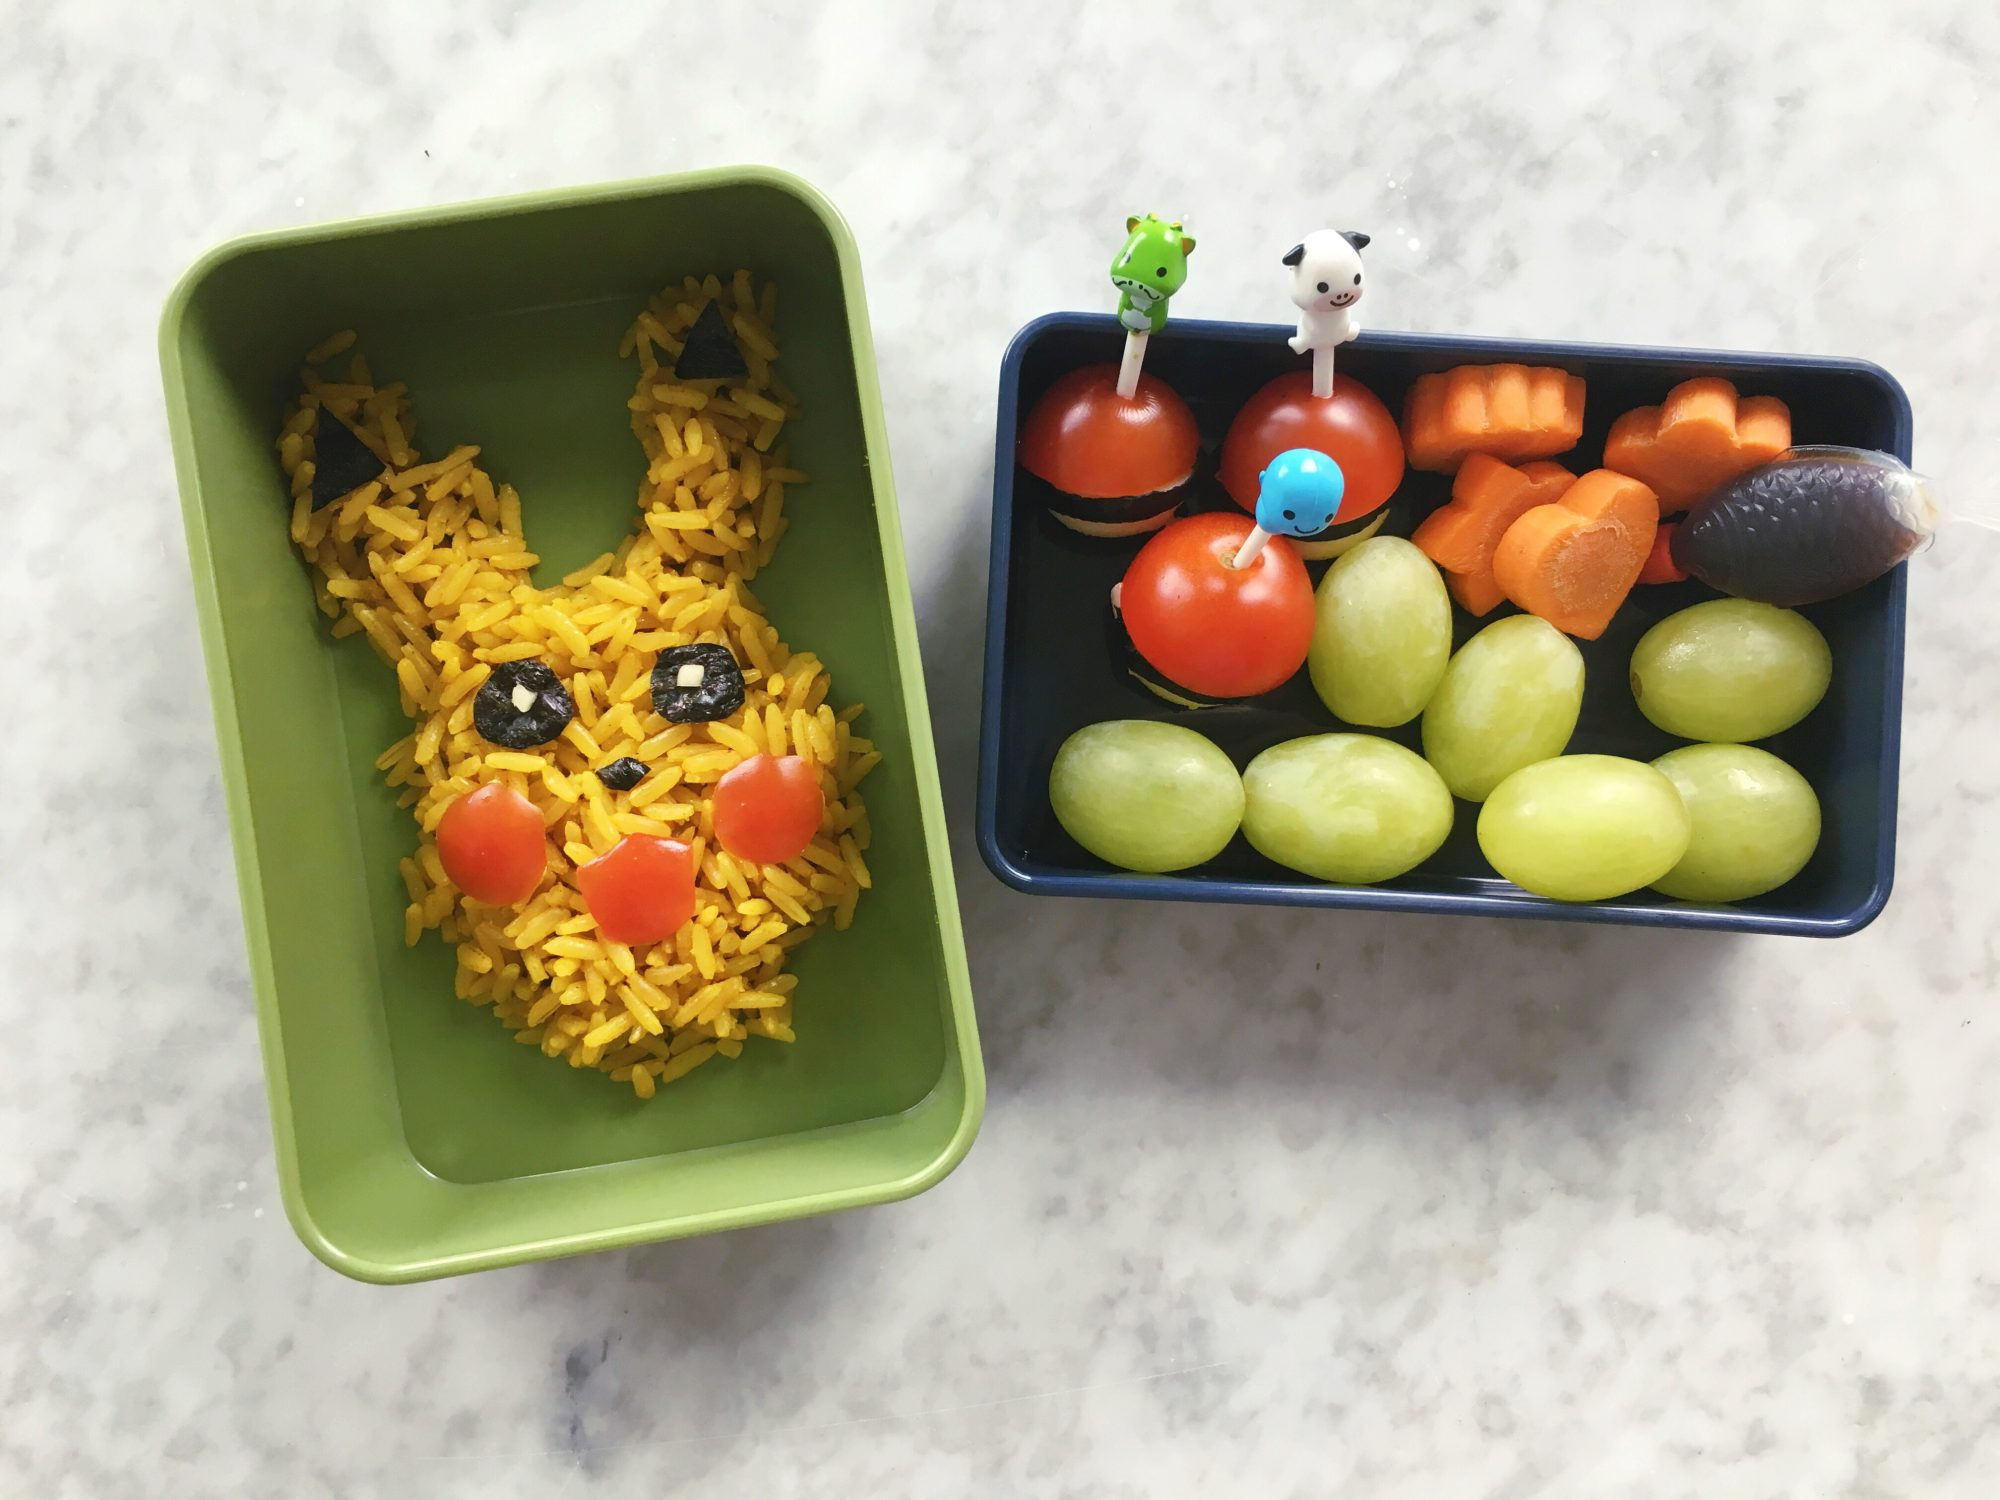 Pokémon To-Go for Lunch: How to Make a Pikachu Bento